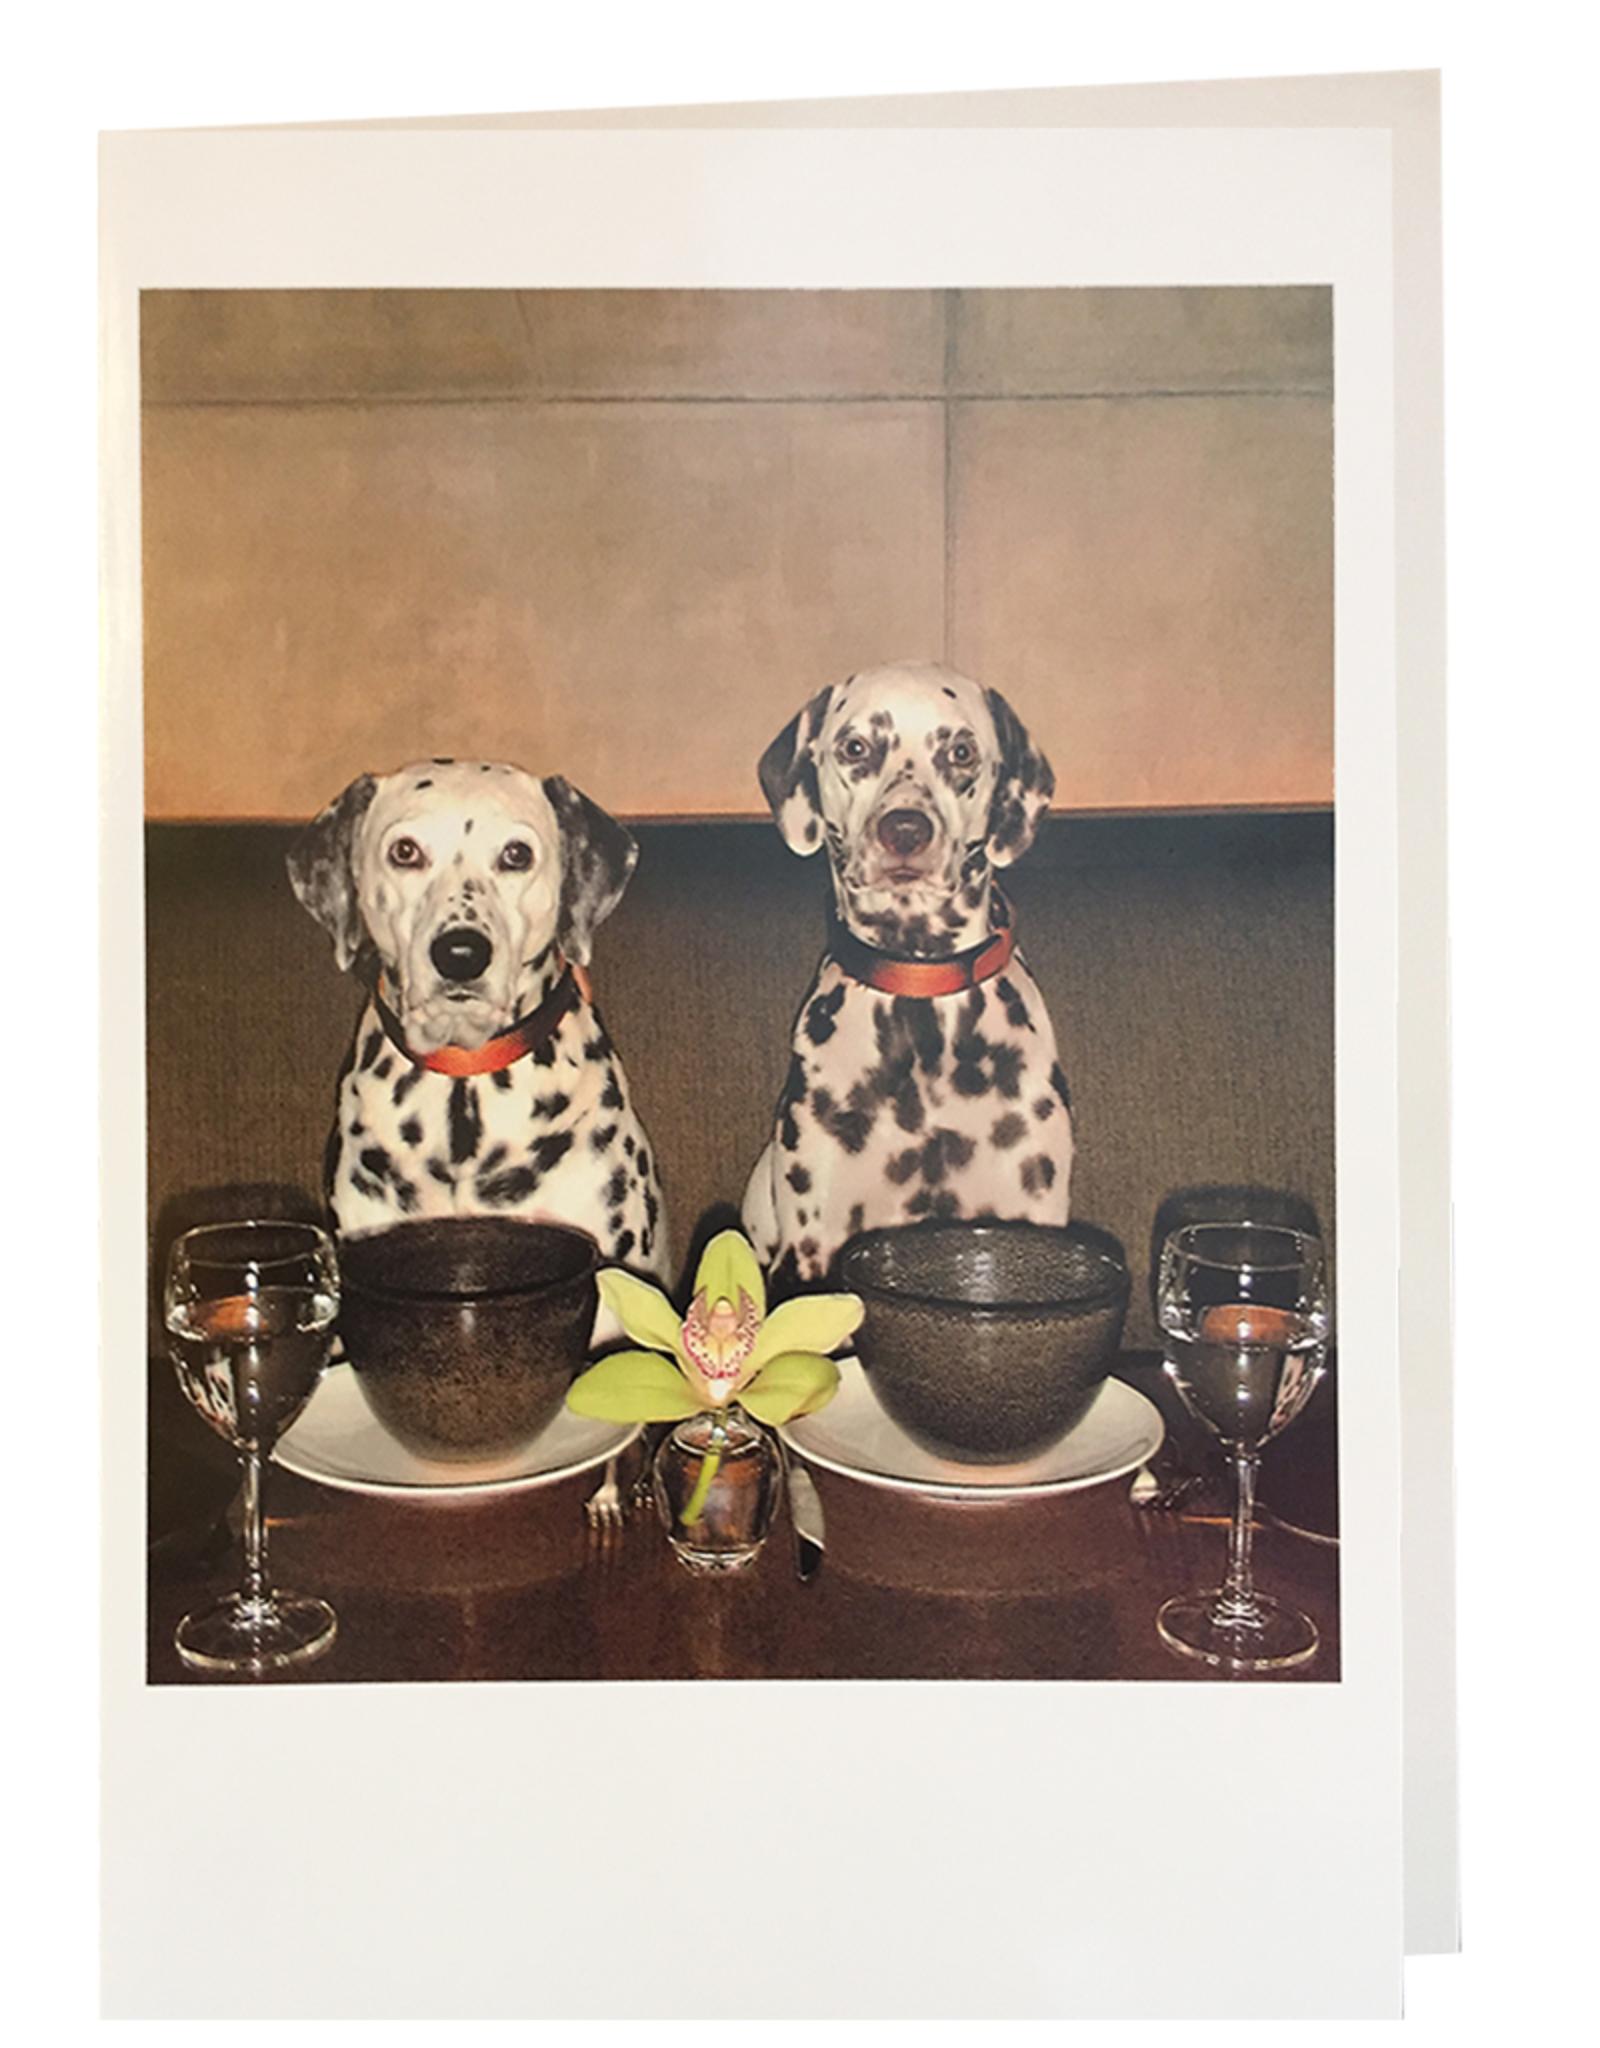 Palm Press Valentine's Day Card Dalmation Puppy Love